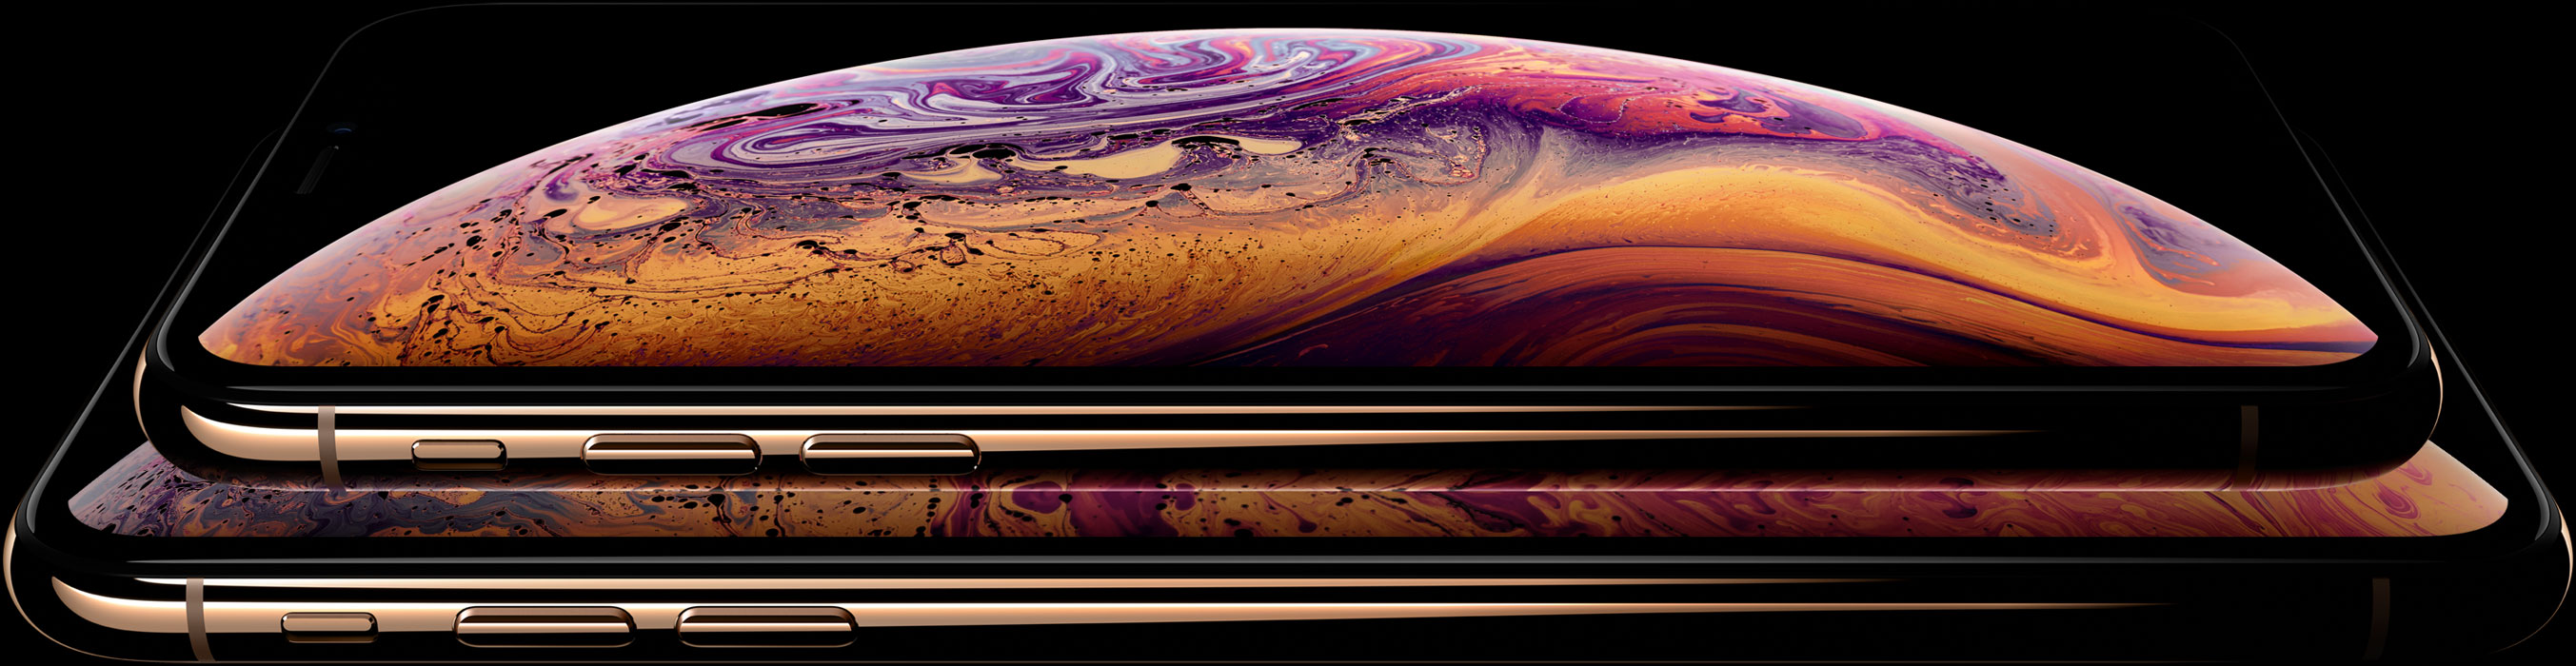 iPhone Xs e Xs Max dourado sobre fundo preto